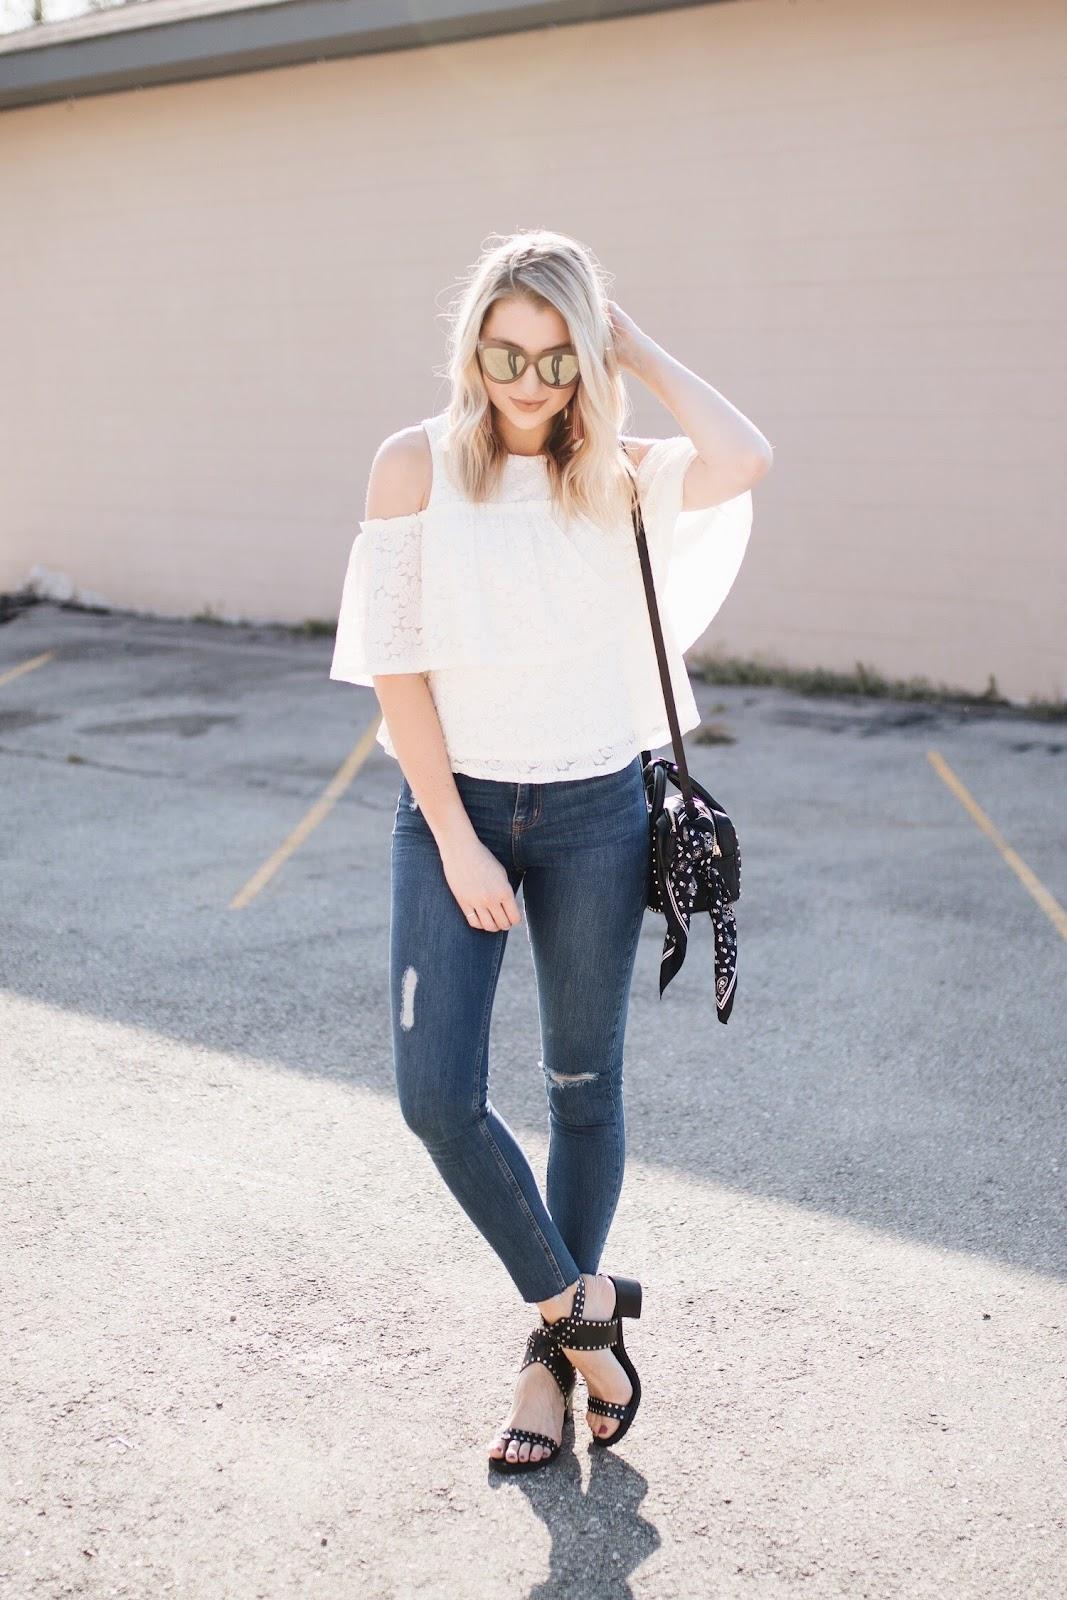 spring outfit idea: cold shoulder top, skinny jeans, studded sandals